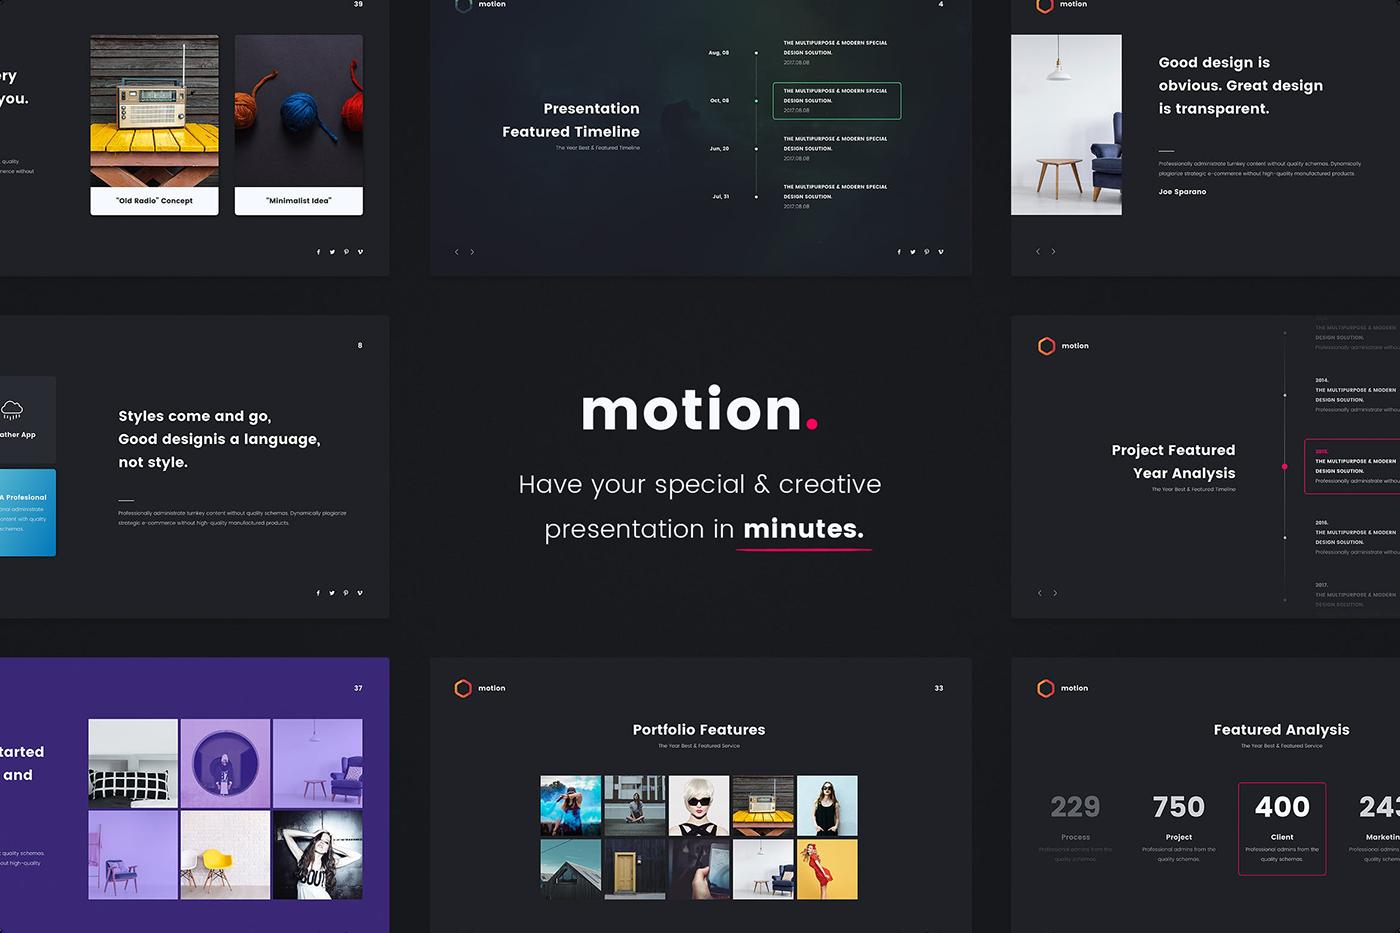 Notify - Animated & Creative Presentation Template (KEY) - 13